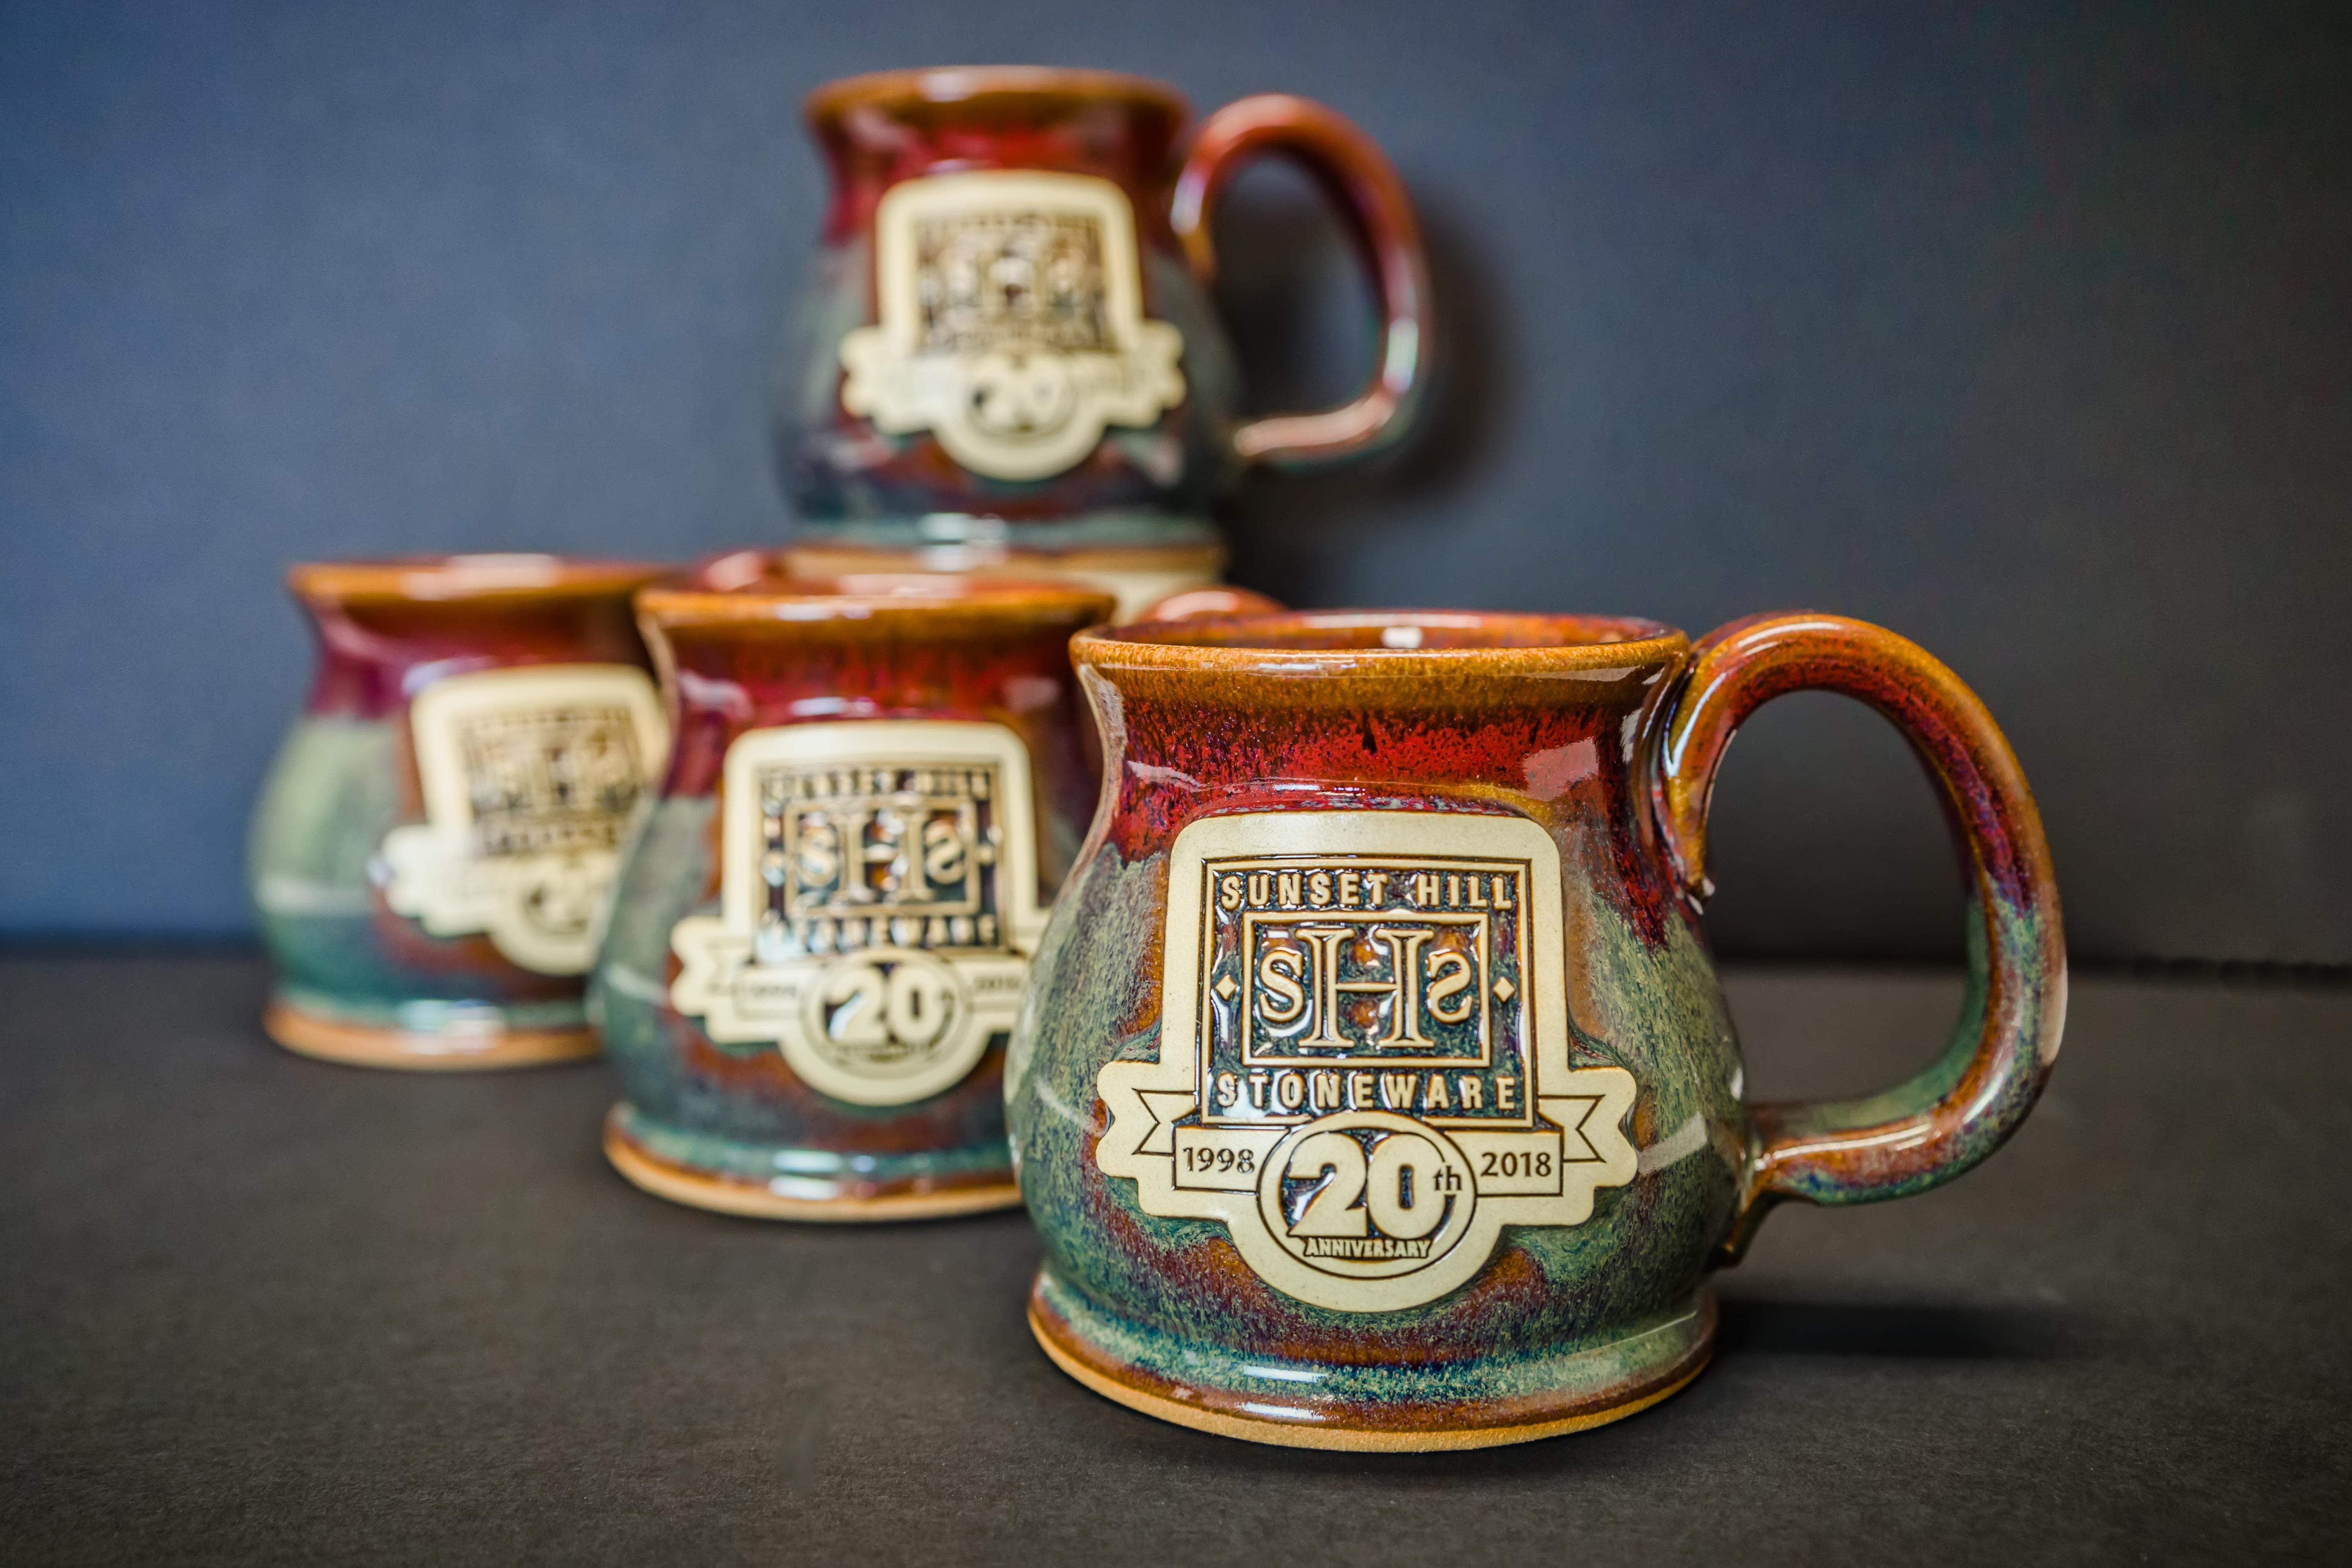 Sunset Hill Stoneware mugs in Cranberry Bog